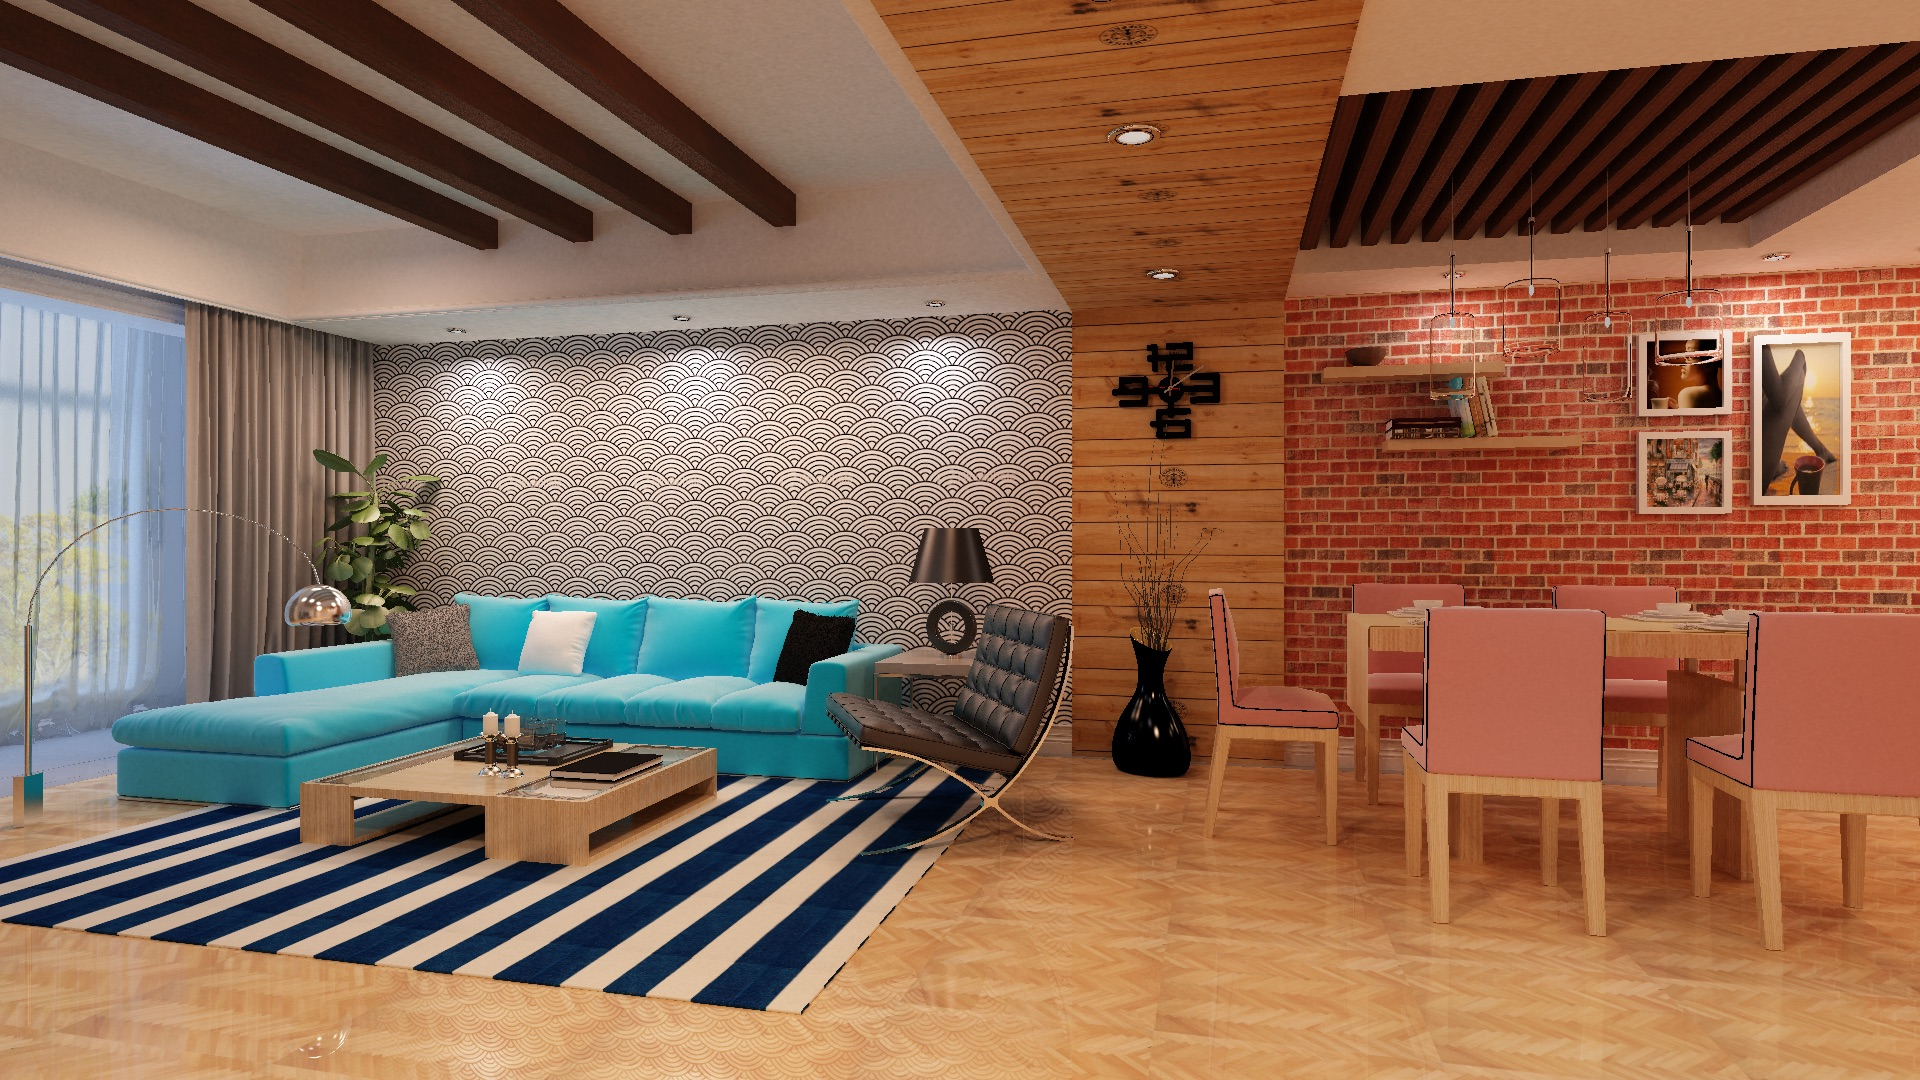 Image for Residential ceiling design Online @ +91-9811327391